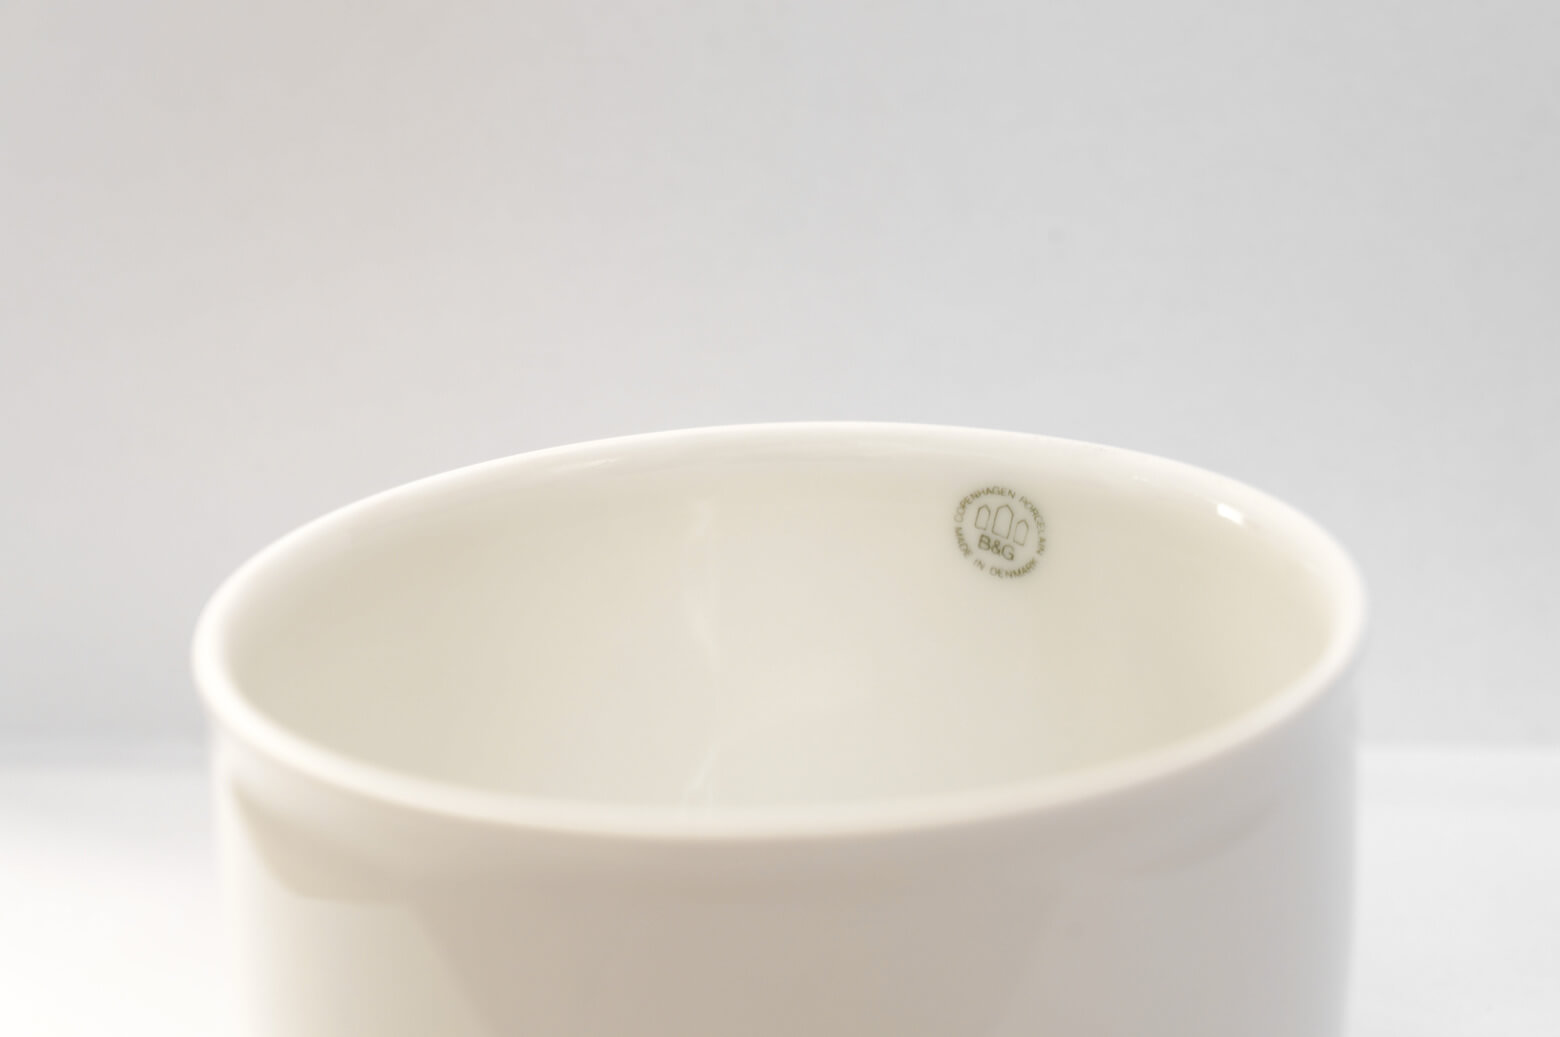 B&G Tea Pot and Cup Martin Hunt/ビングオーグレンダール ティーポット カップ セット マーティン・ハント デンマーク 北欧食器 ヴィンテージ 2